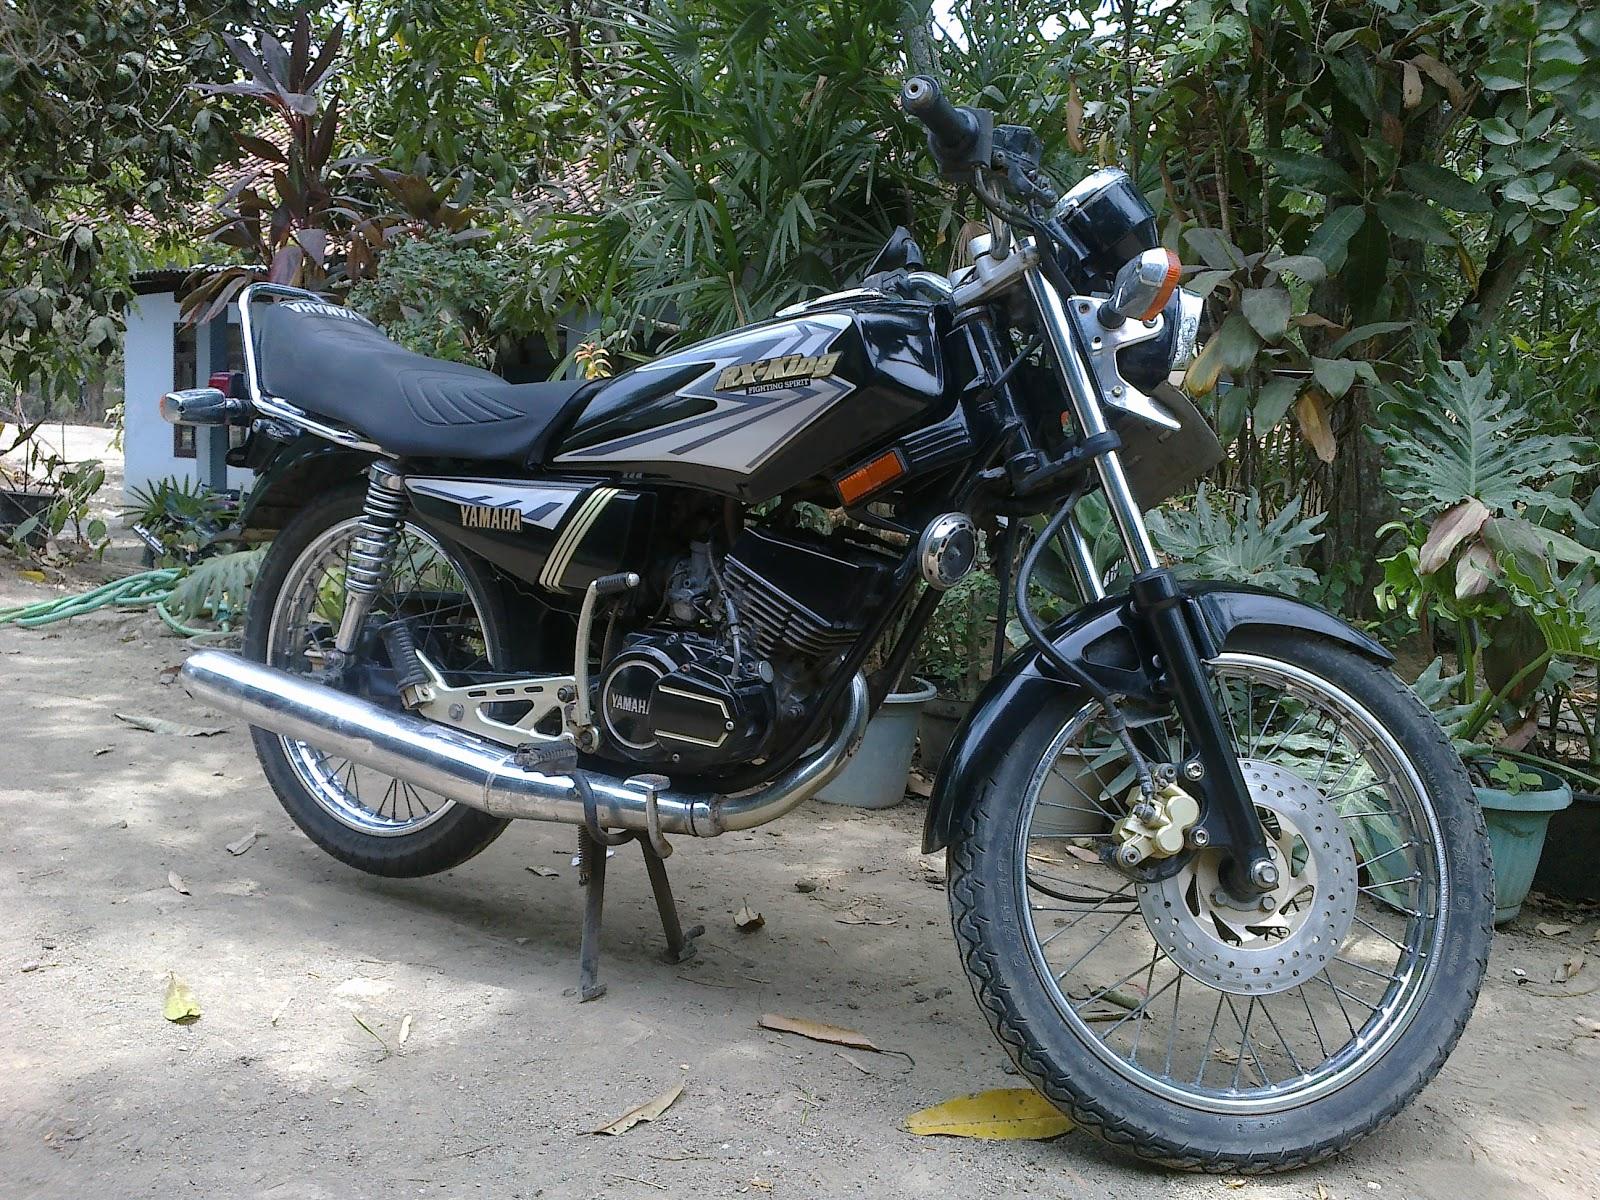 Modifikasi Yamaha Rx King Gambar Modifikasi Motor Terbaru